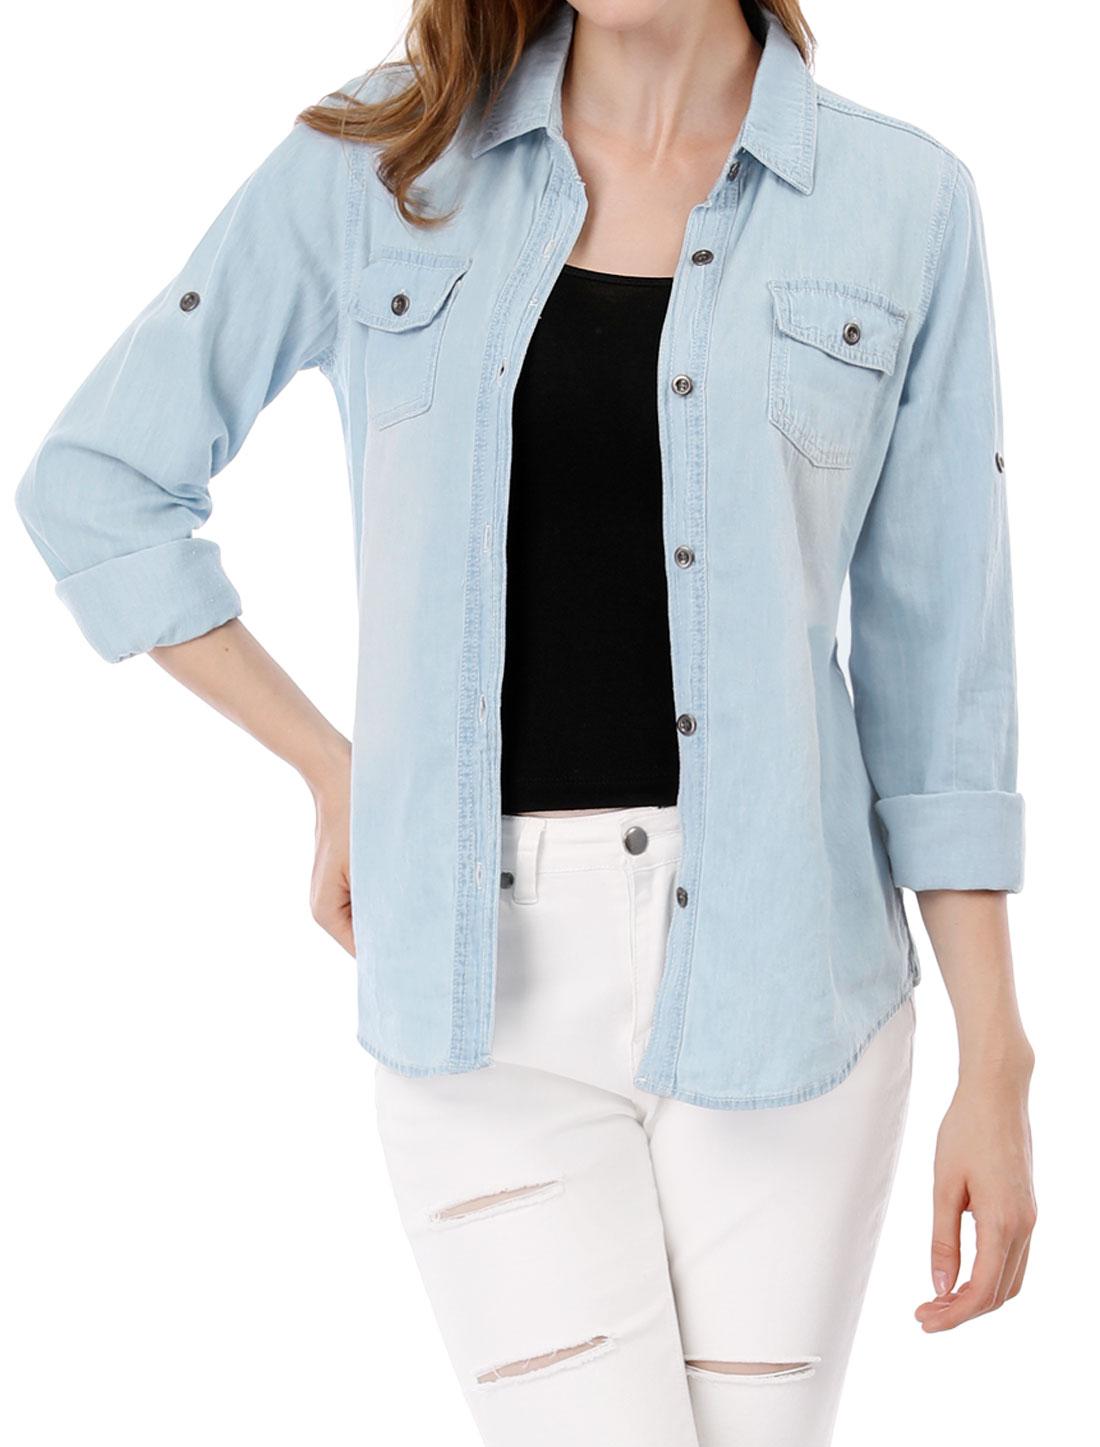 Women Single Breated Point Collar Western Denim Shirt Light Blue L